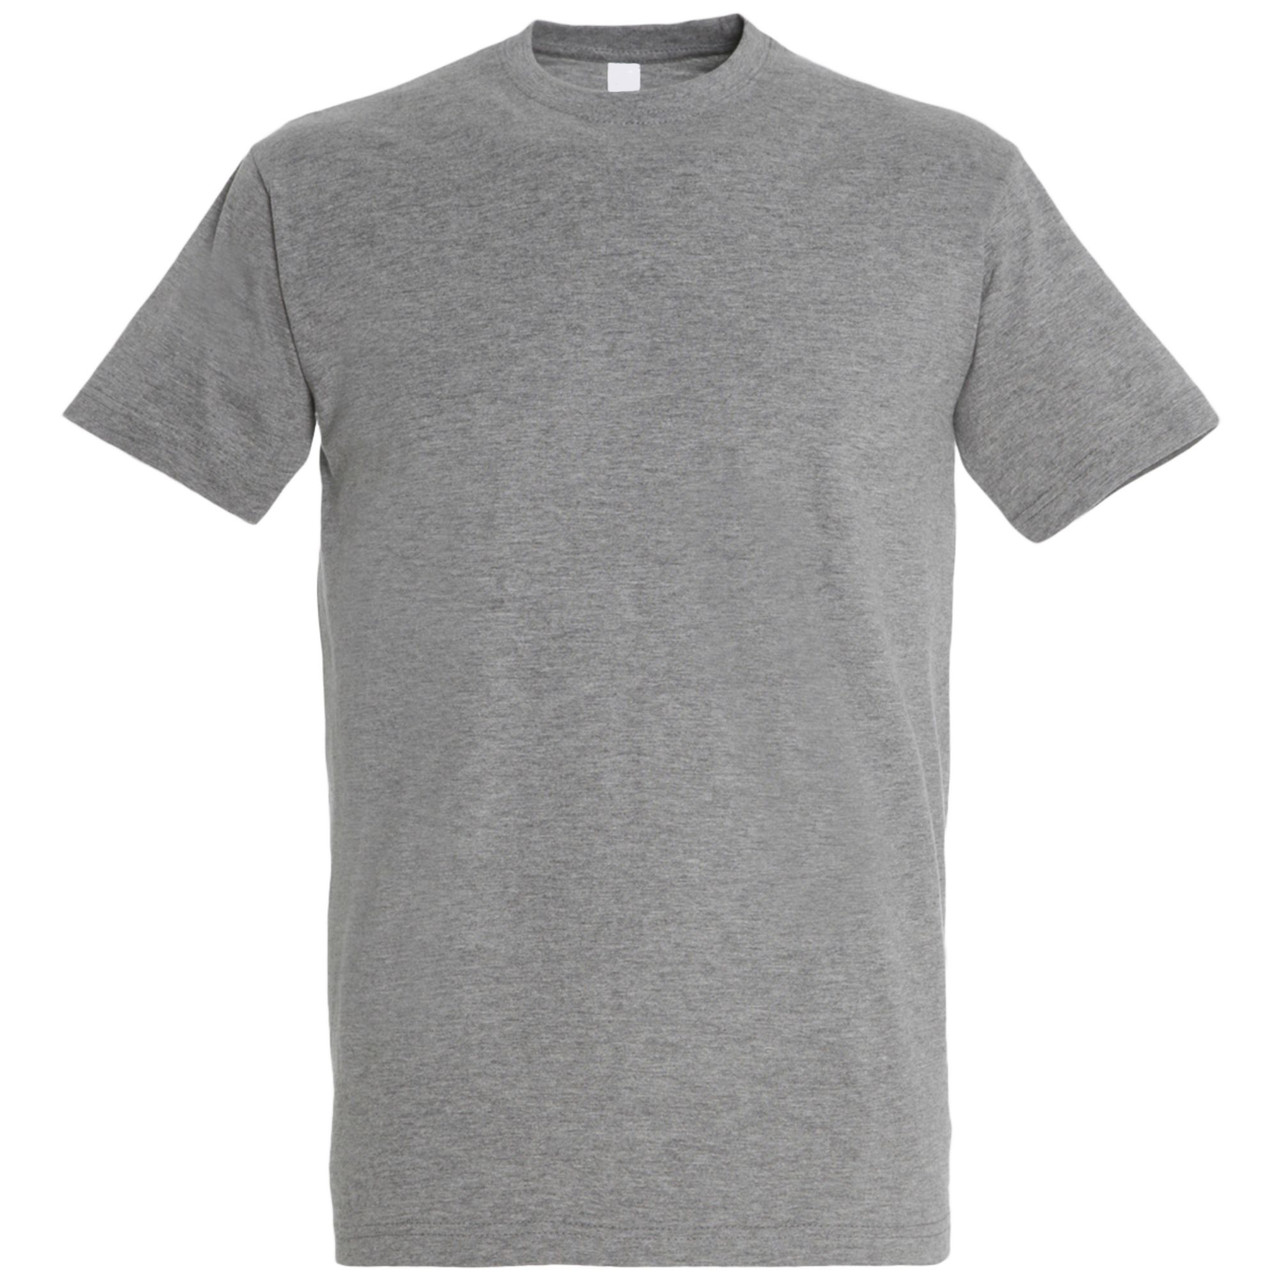 Oднотонная футболка | Серый меланж | 160 гр. | XS